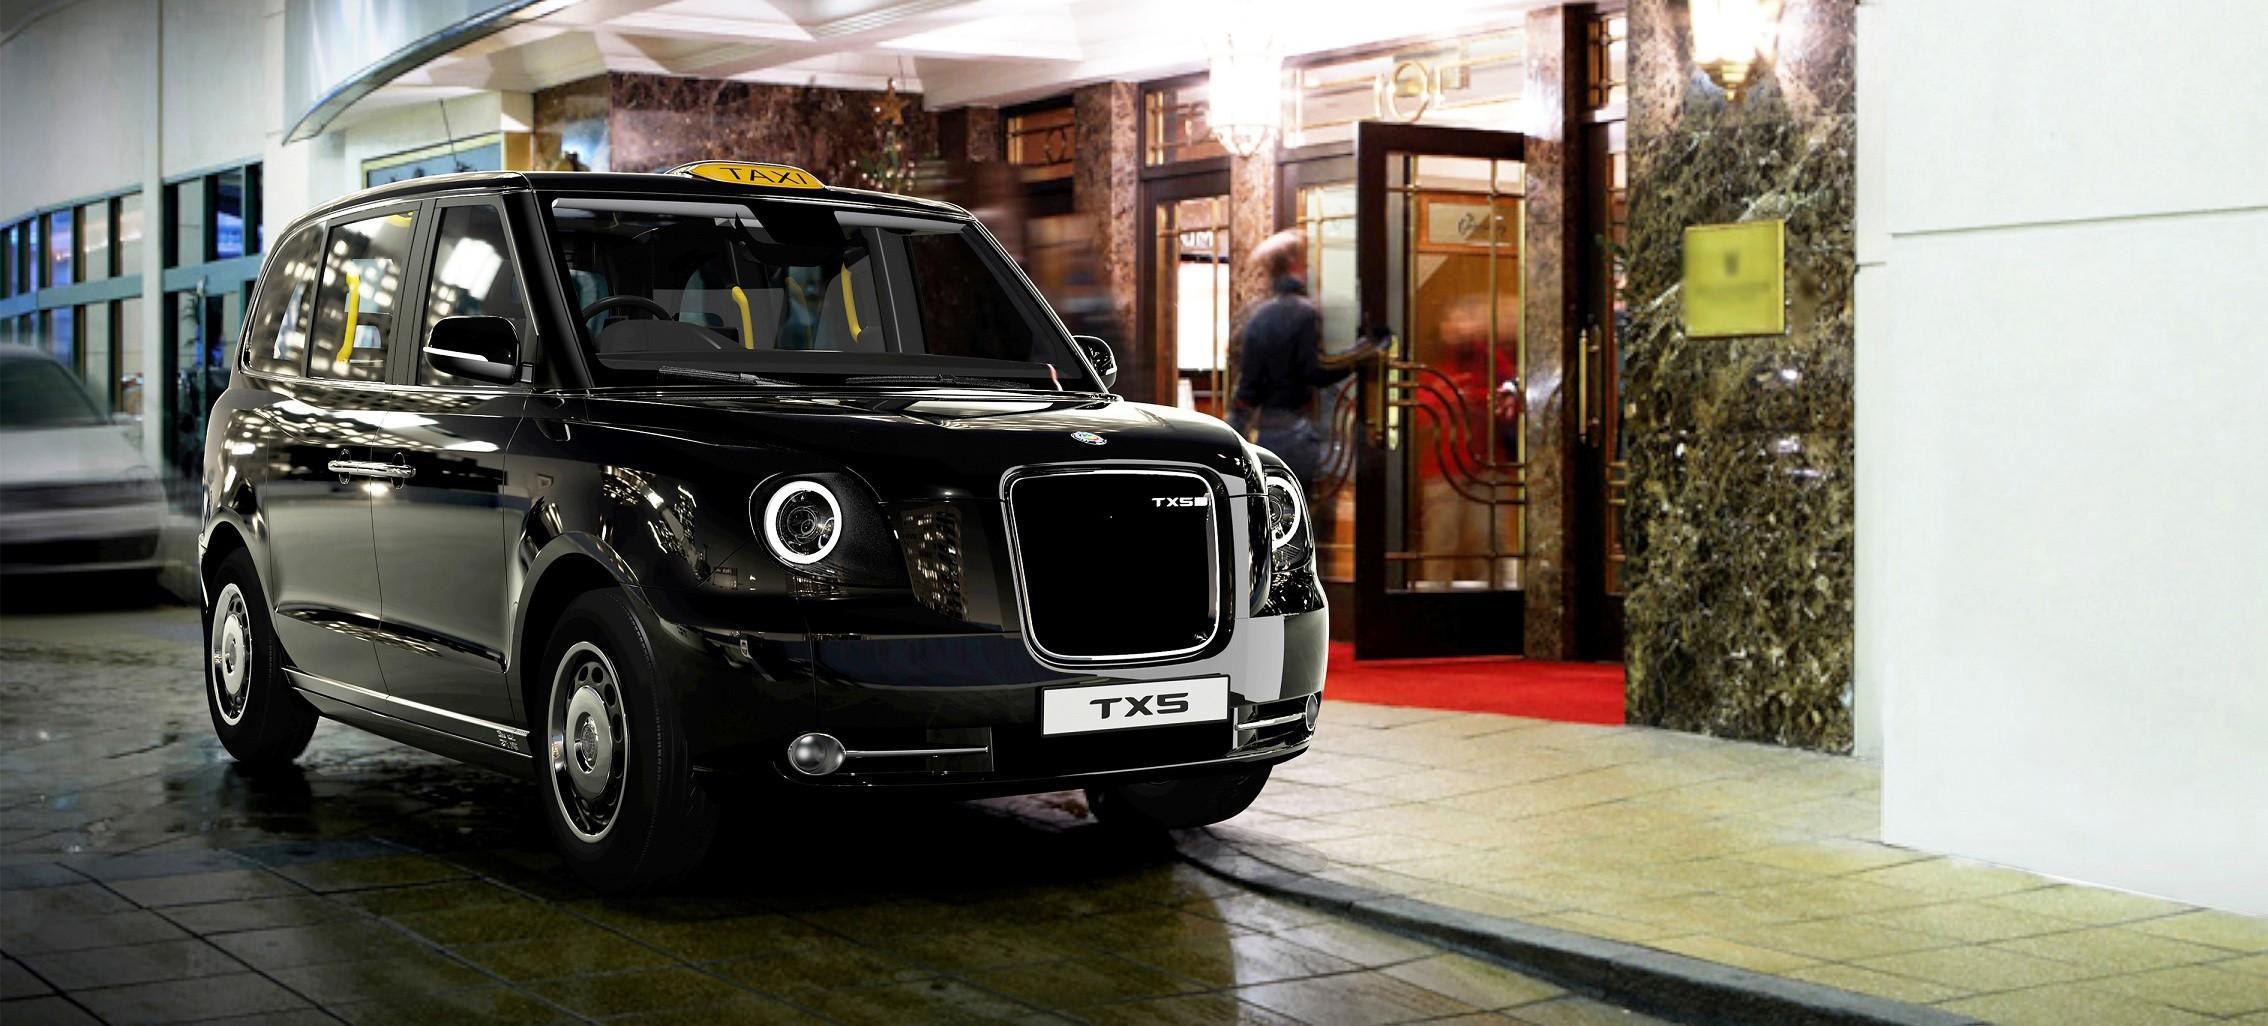 2018 London Taxi Company TX5 Looks Production Ready In Latest Spy Pics - autoevolution